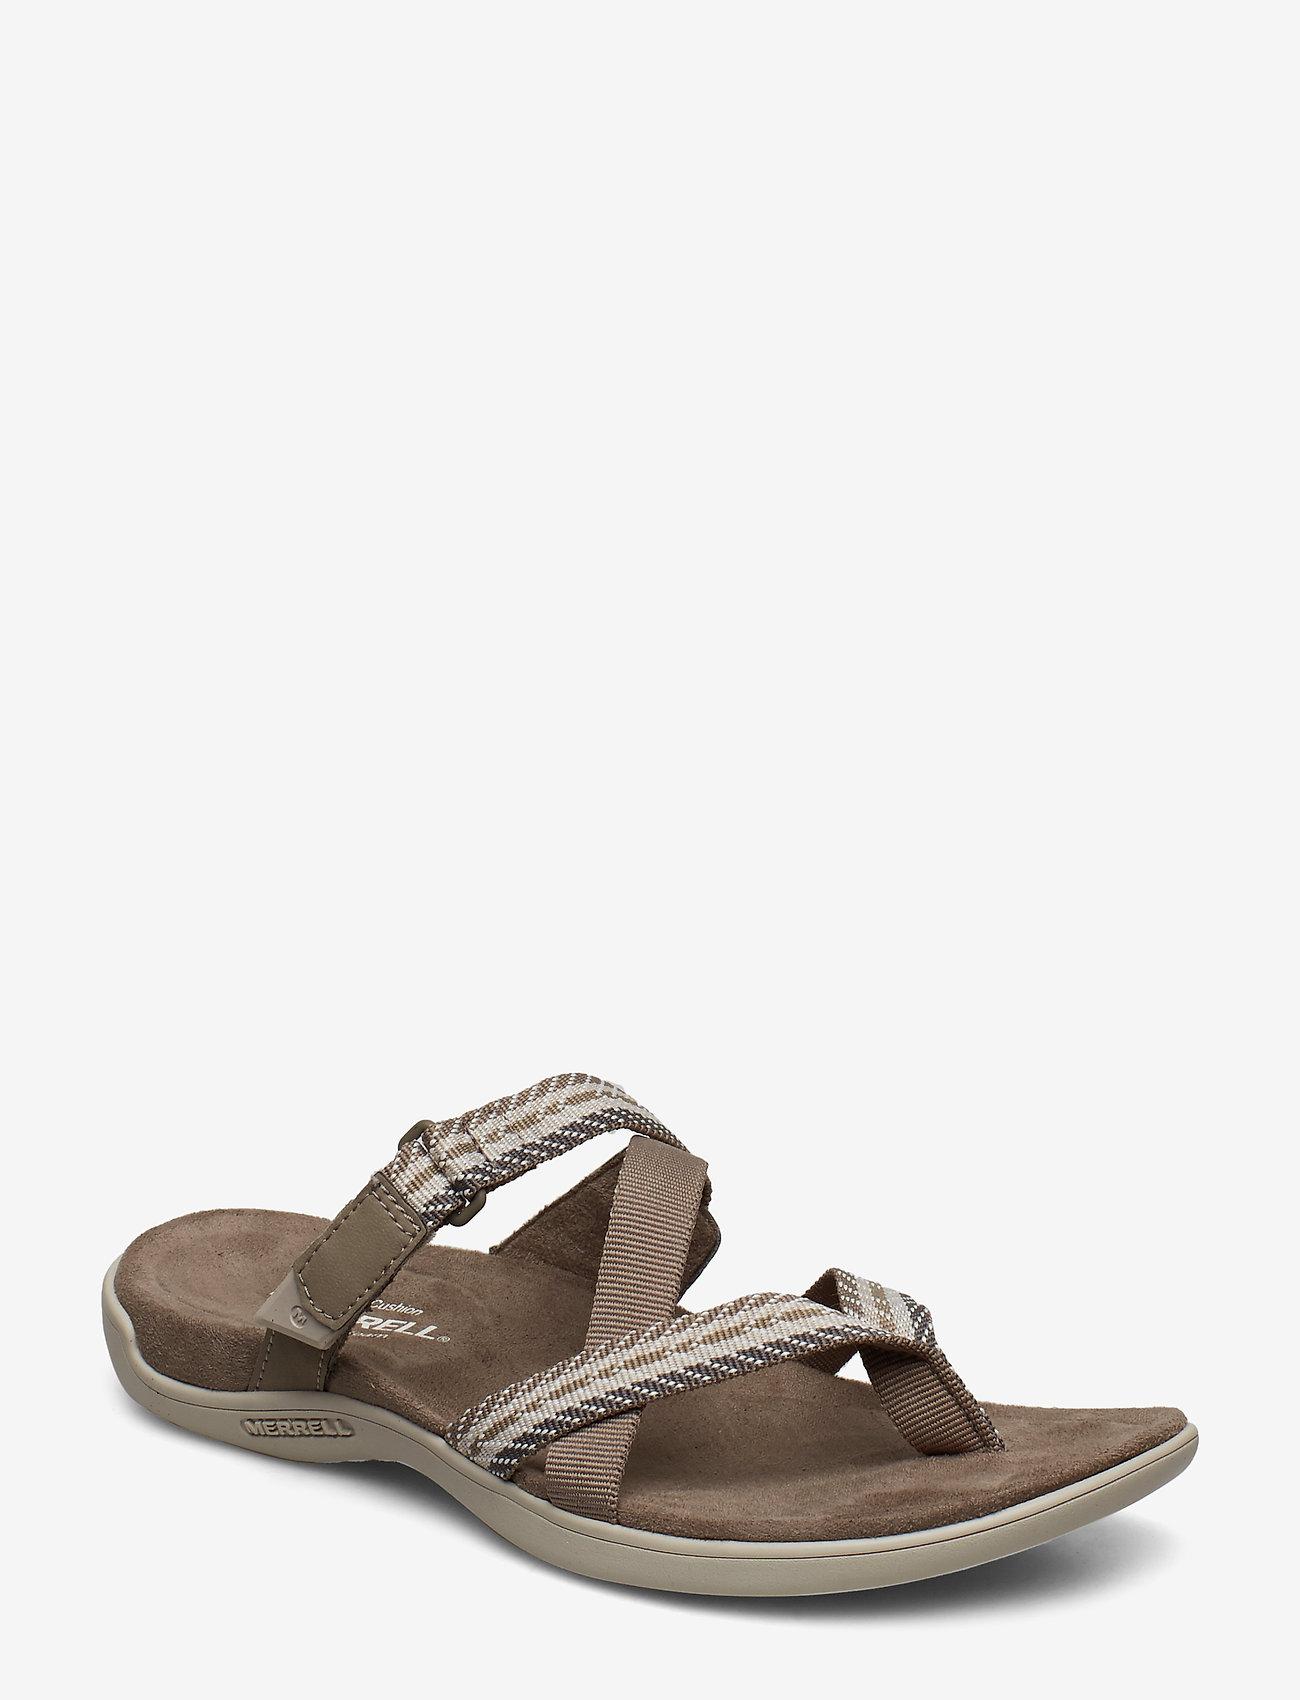 Merrell - District Mendi Thong Brindle - hiking sandals - brindle - 0